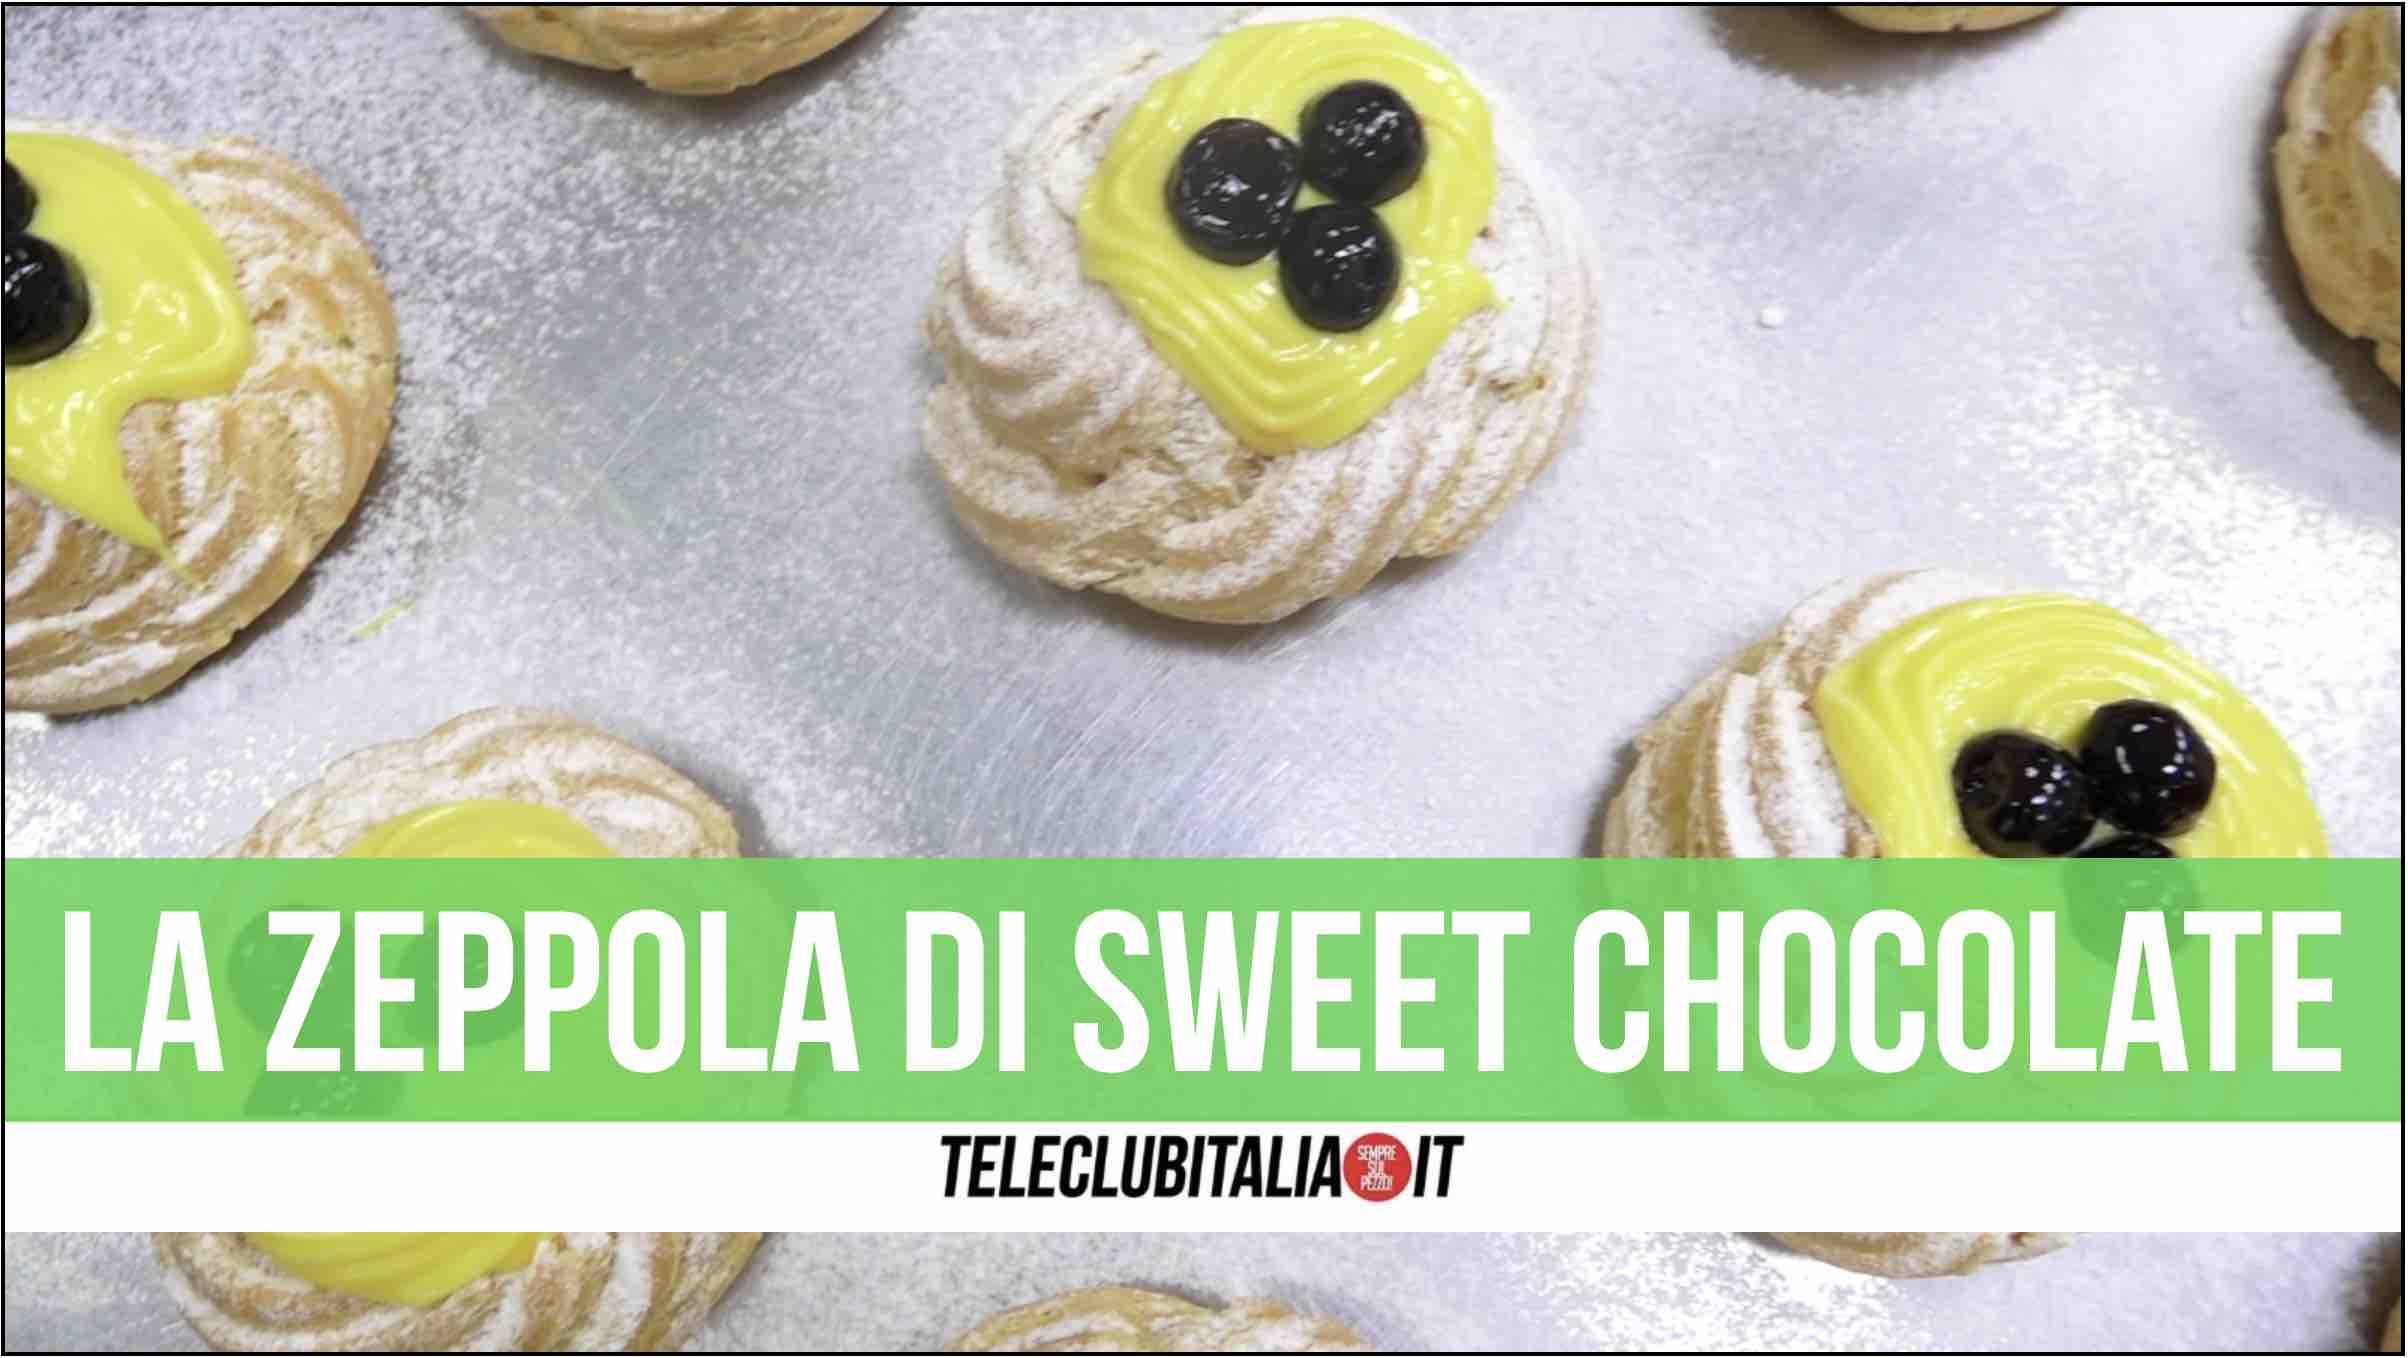 sweet chocolate giugliano maria de vito pastry chef zeppola di san giuseppe